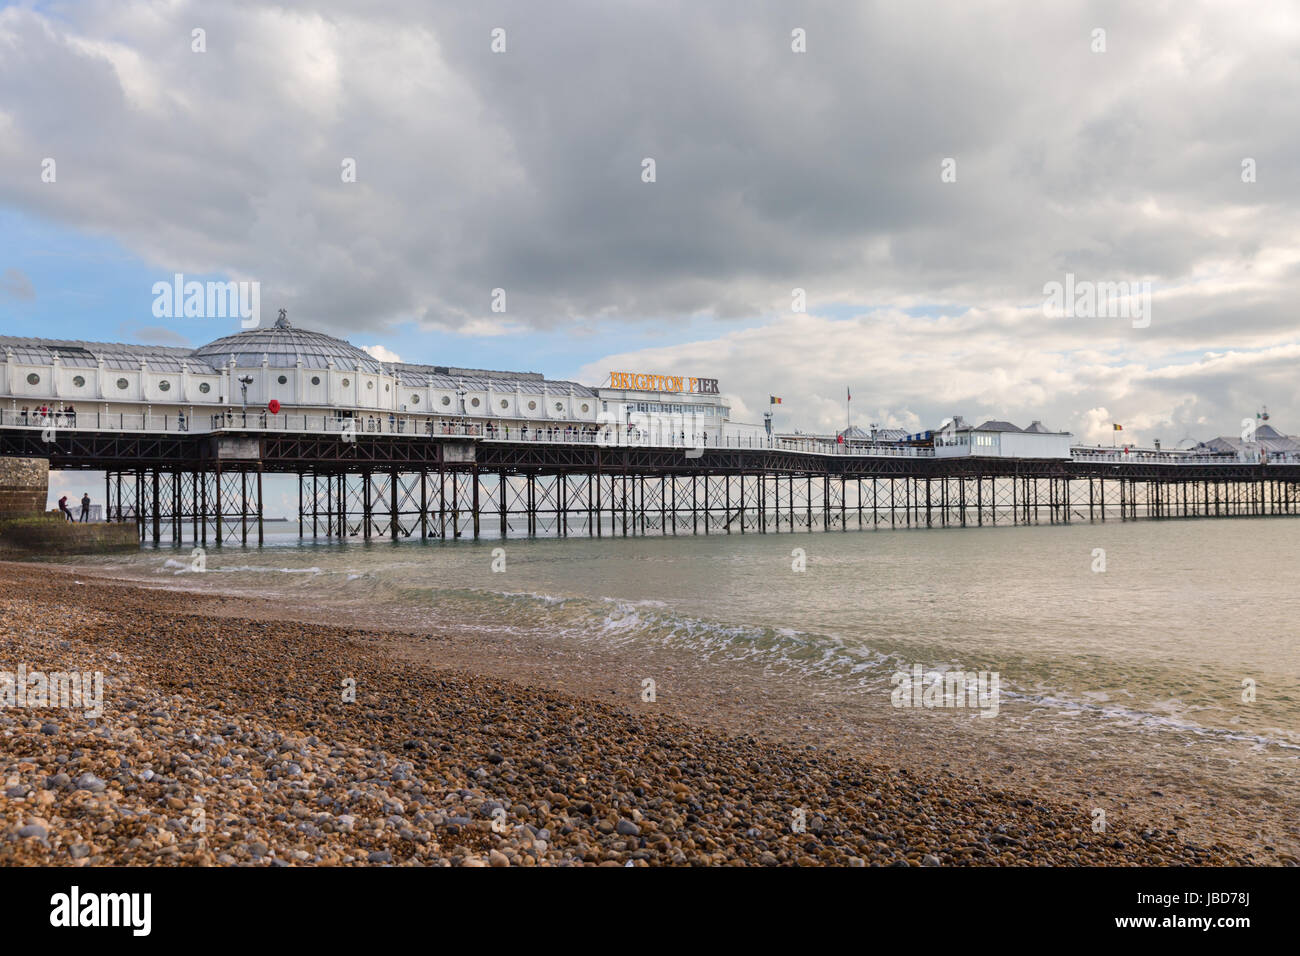 Brighton Palace Pier, Victorian Pleasure Pier in Brighton, England, UK - Stock Image